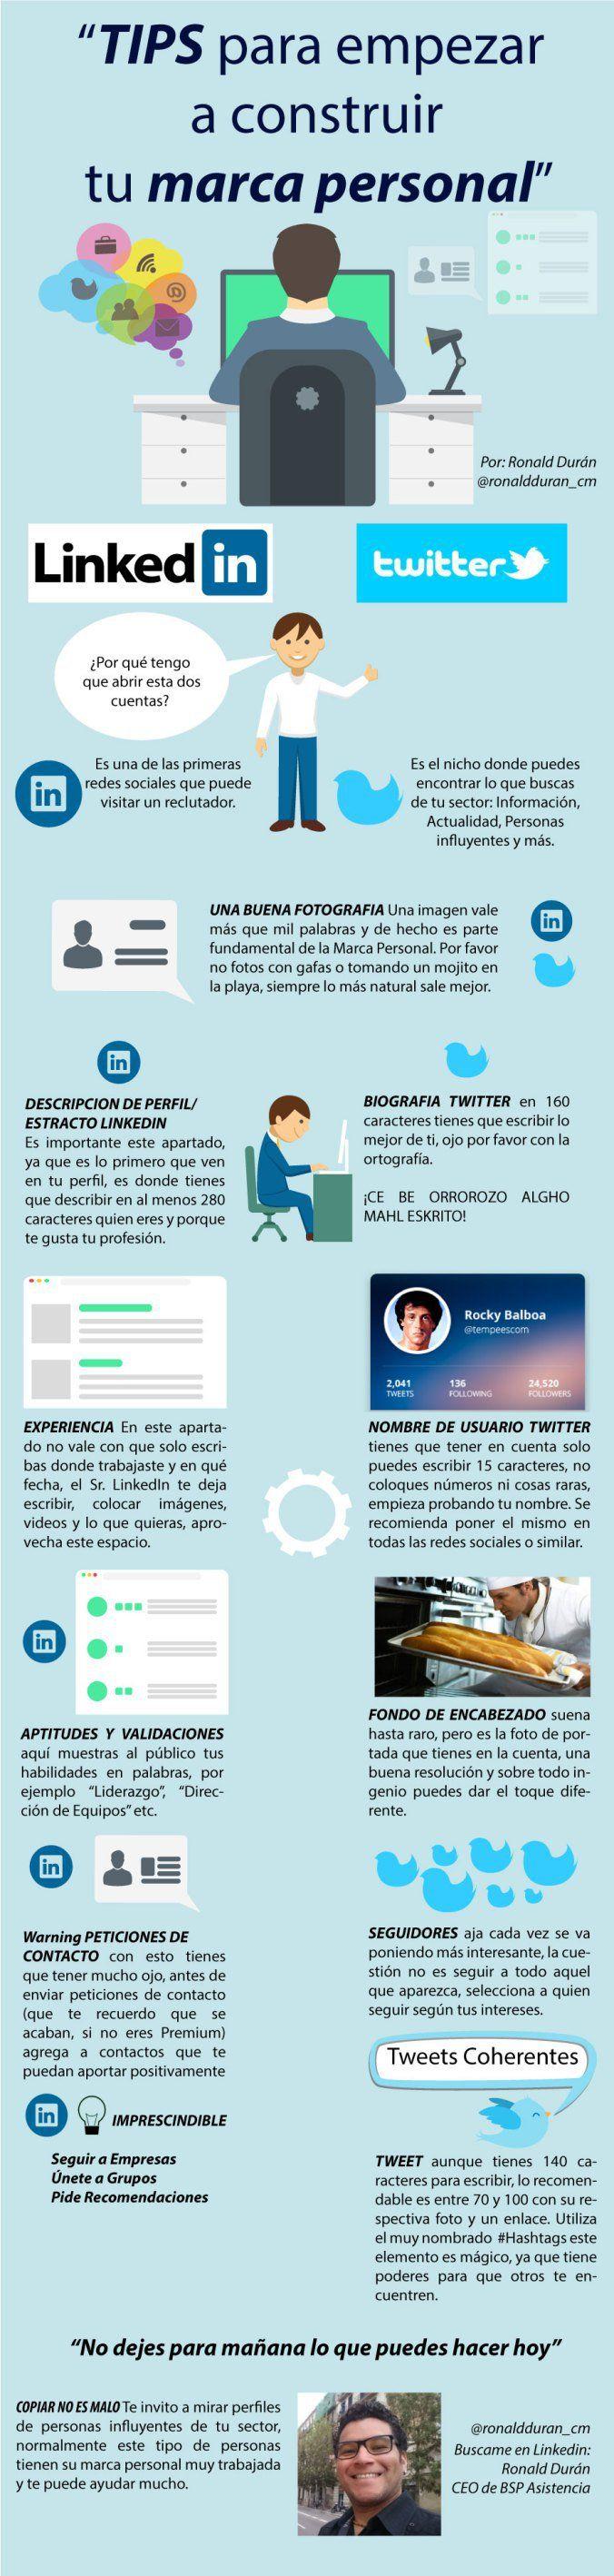 Consejos Para Construir Tu Marca Personal #infografia en español #CommunityManager